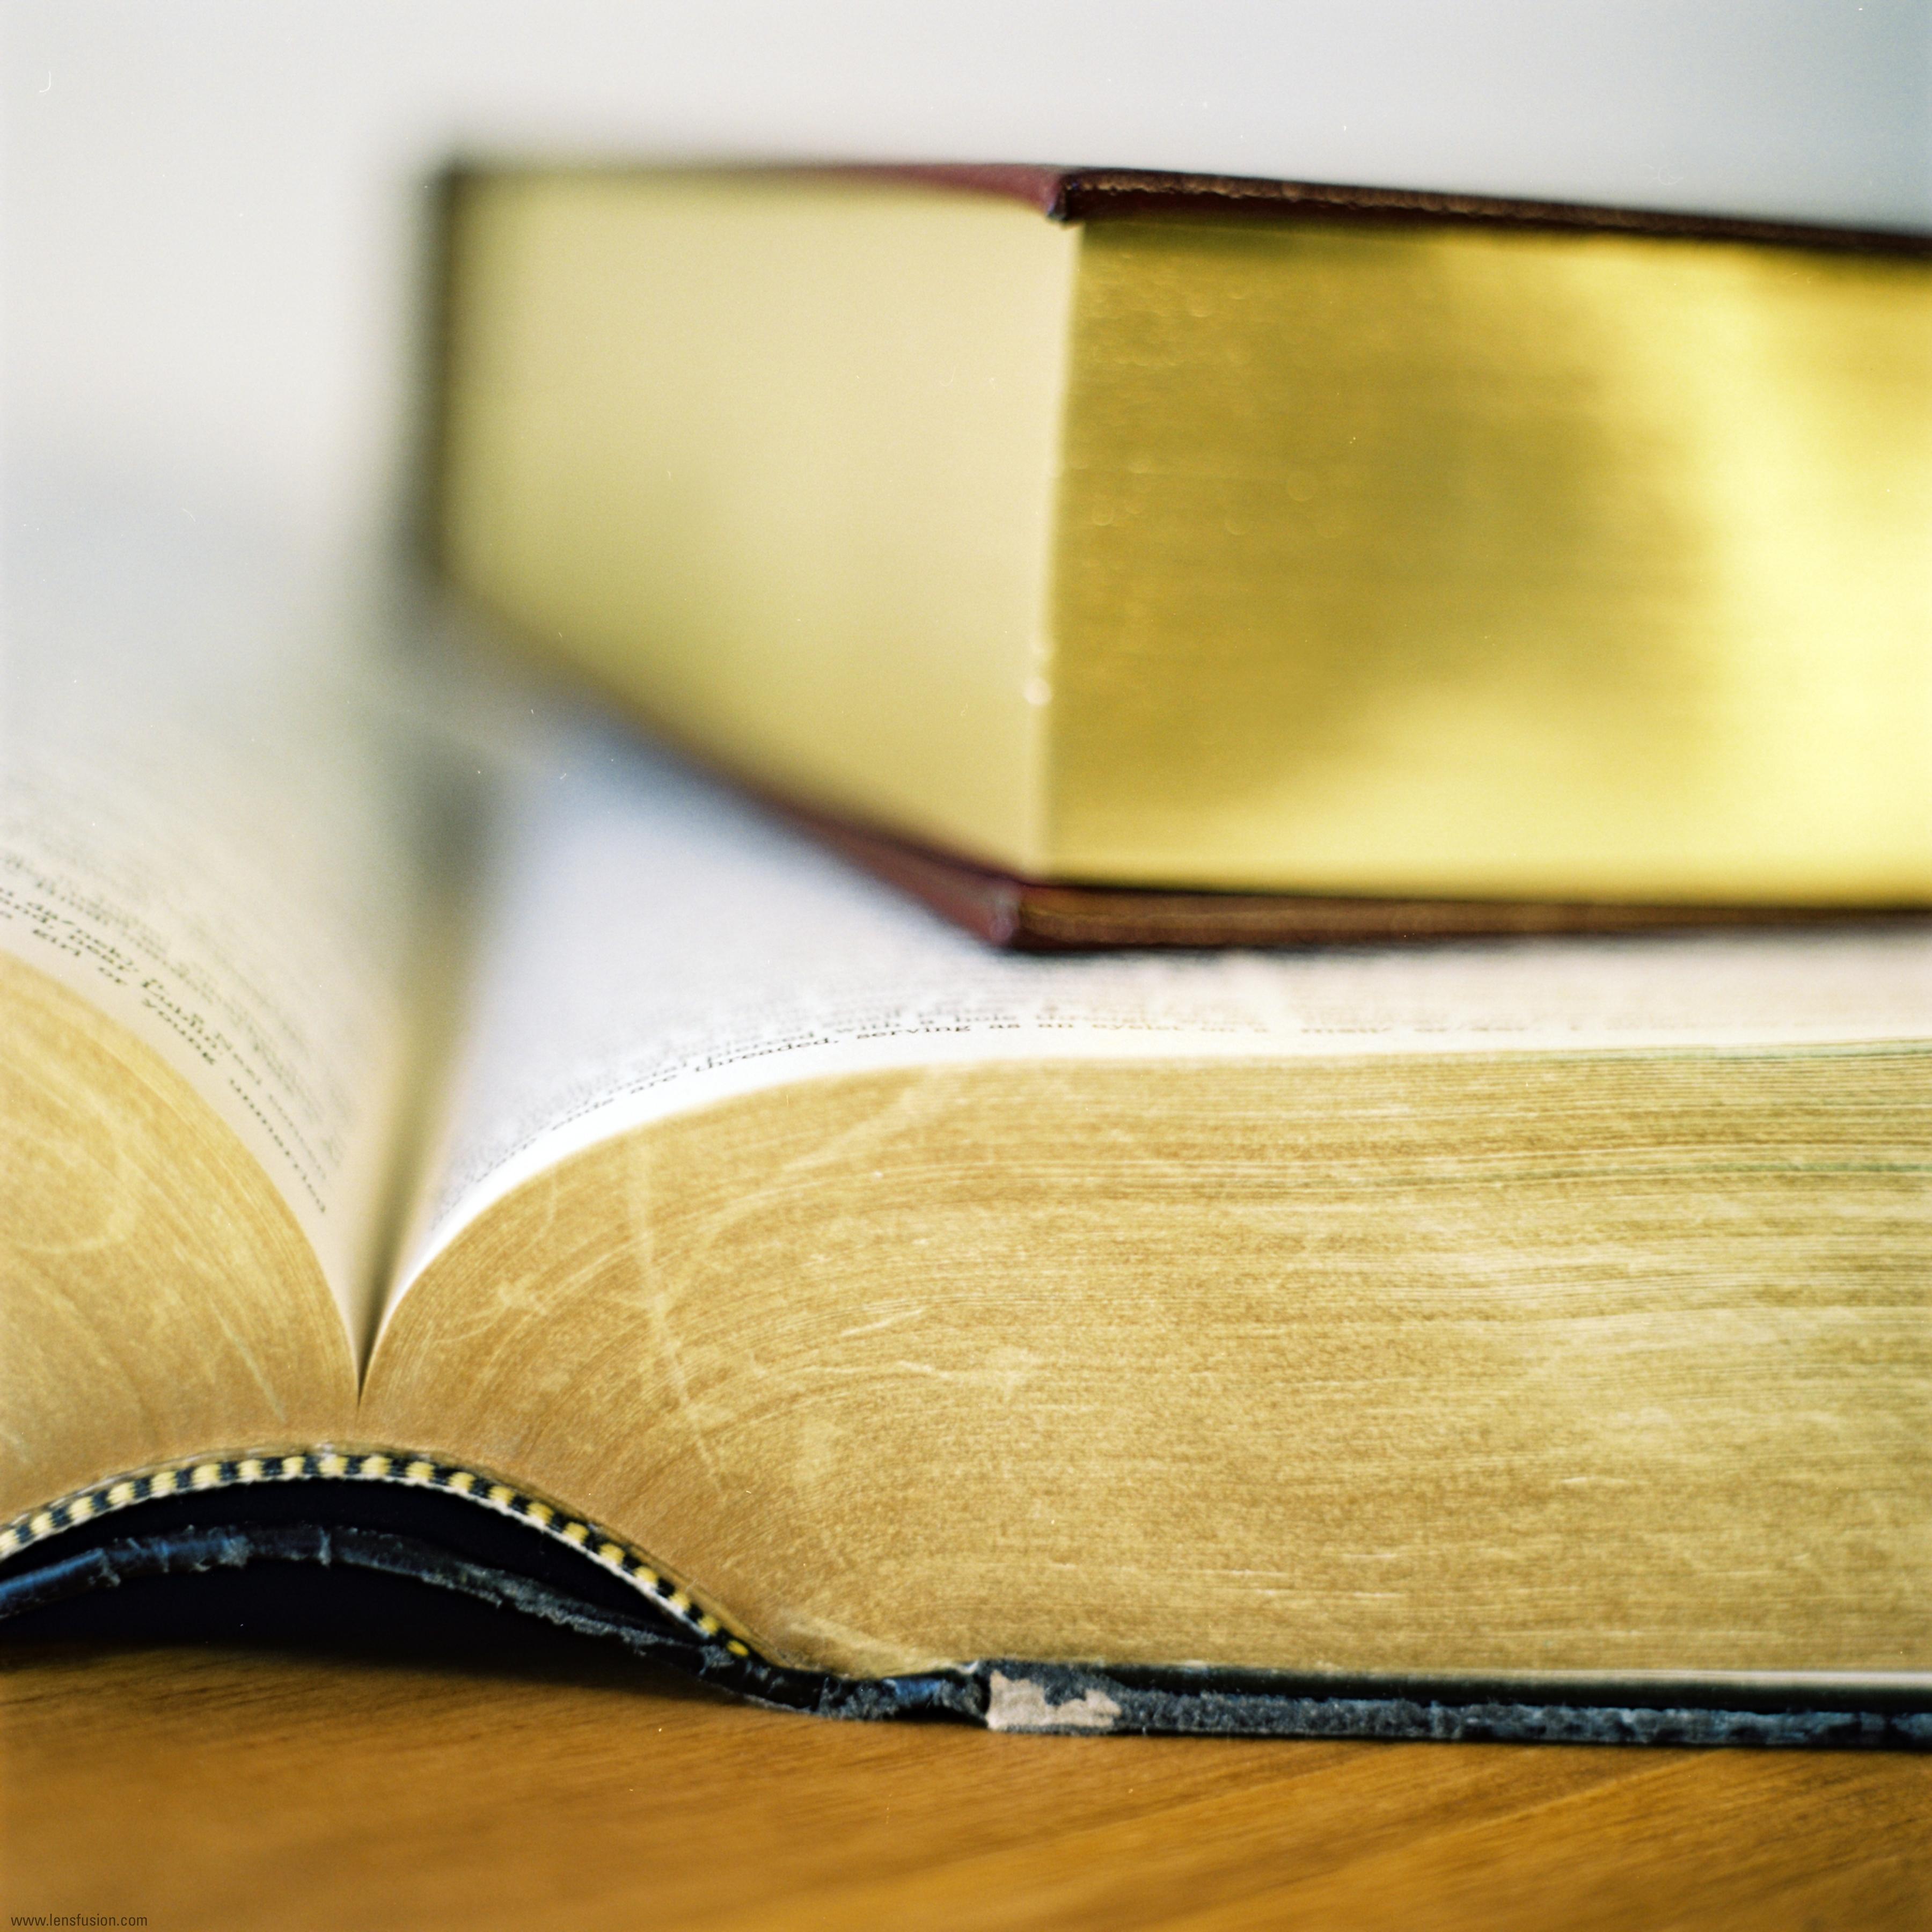 30 de abril: Legalizar libros contables